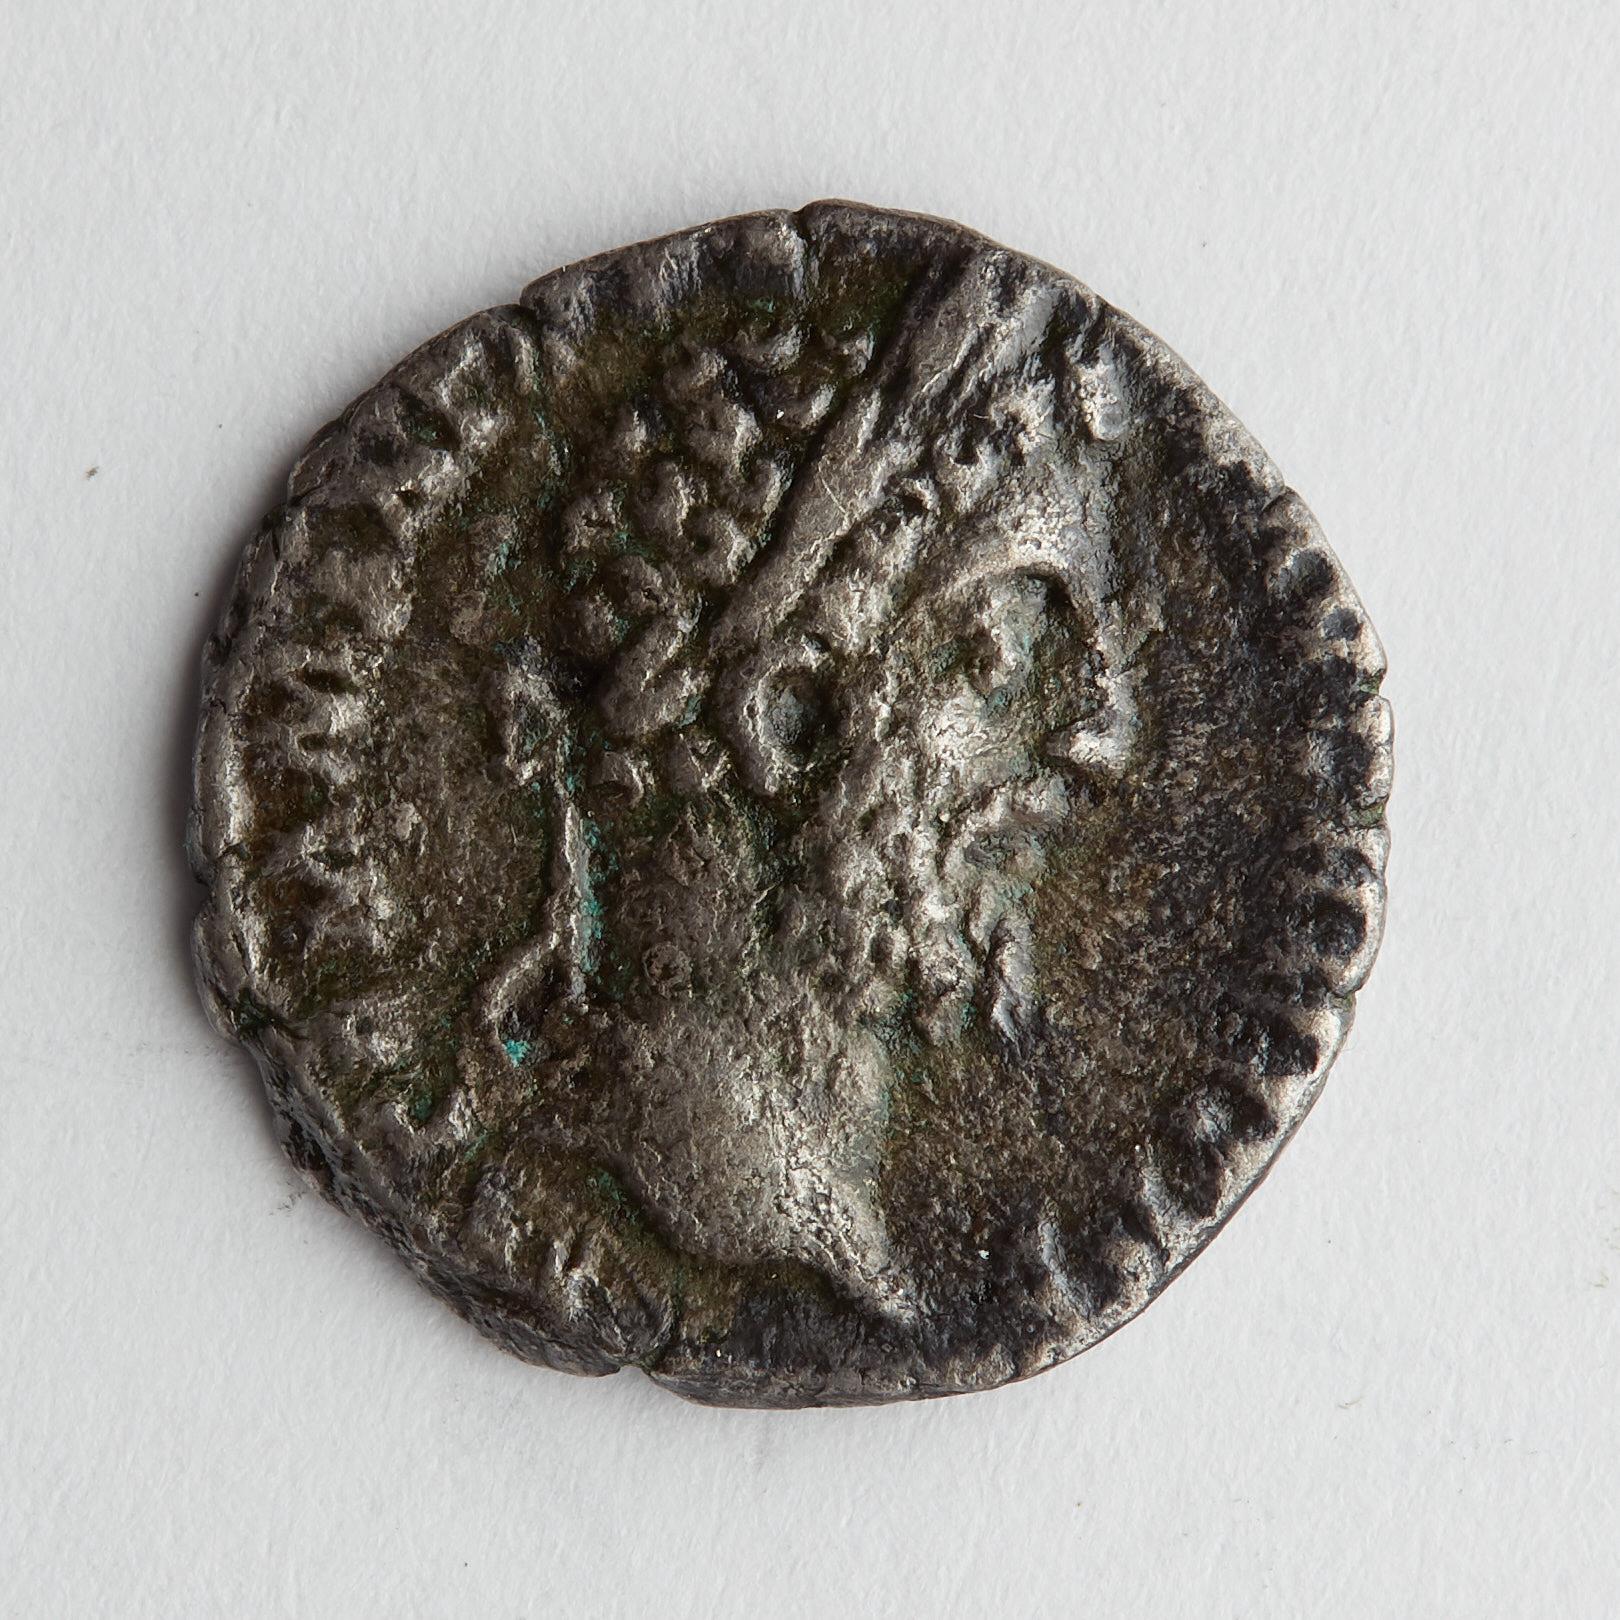 Lot 205: Grp: 4 Coins- 5 Cartwheel Penny - 5 kopek - tetradrachm - Danarius